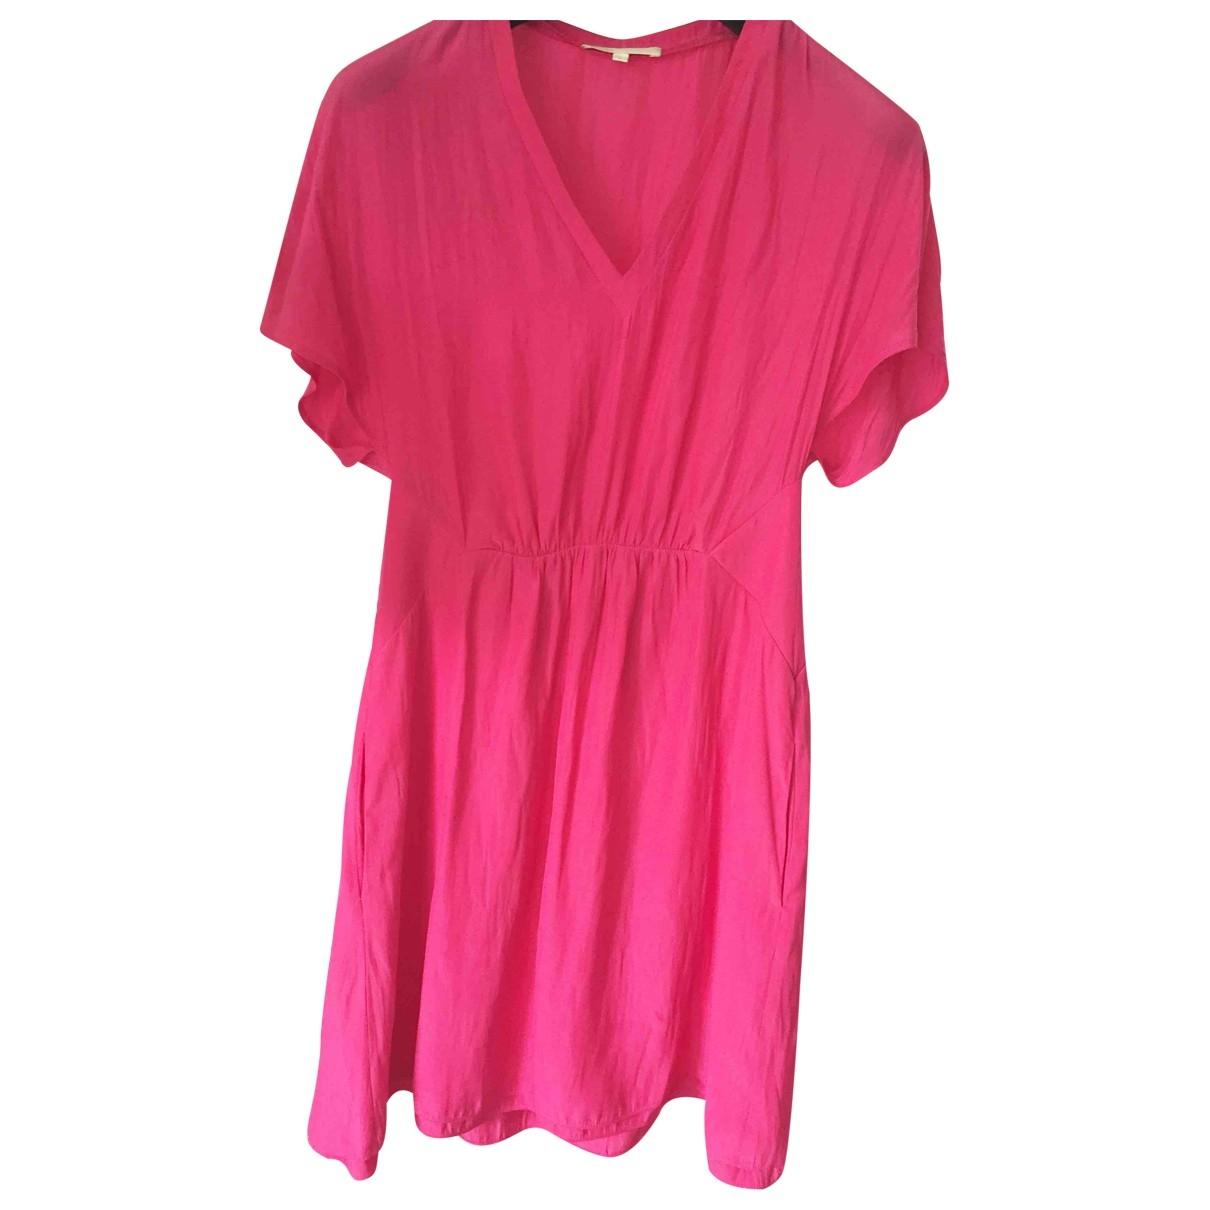 Maje \N Pink dress for Women 1 US